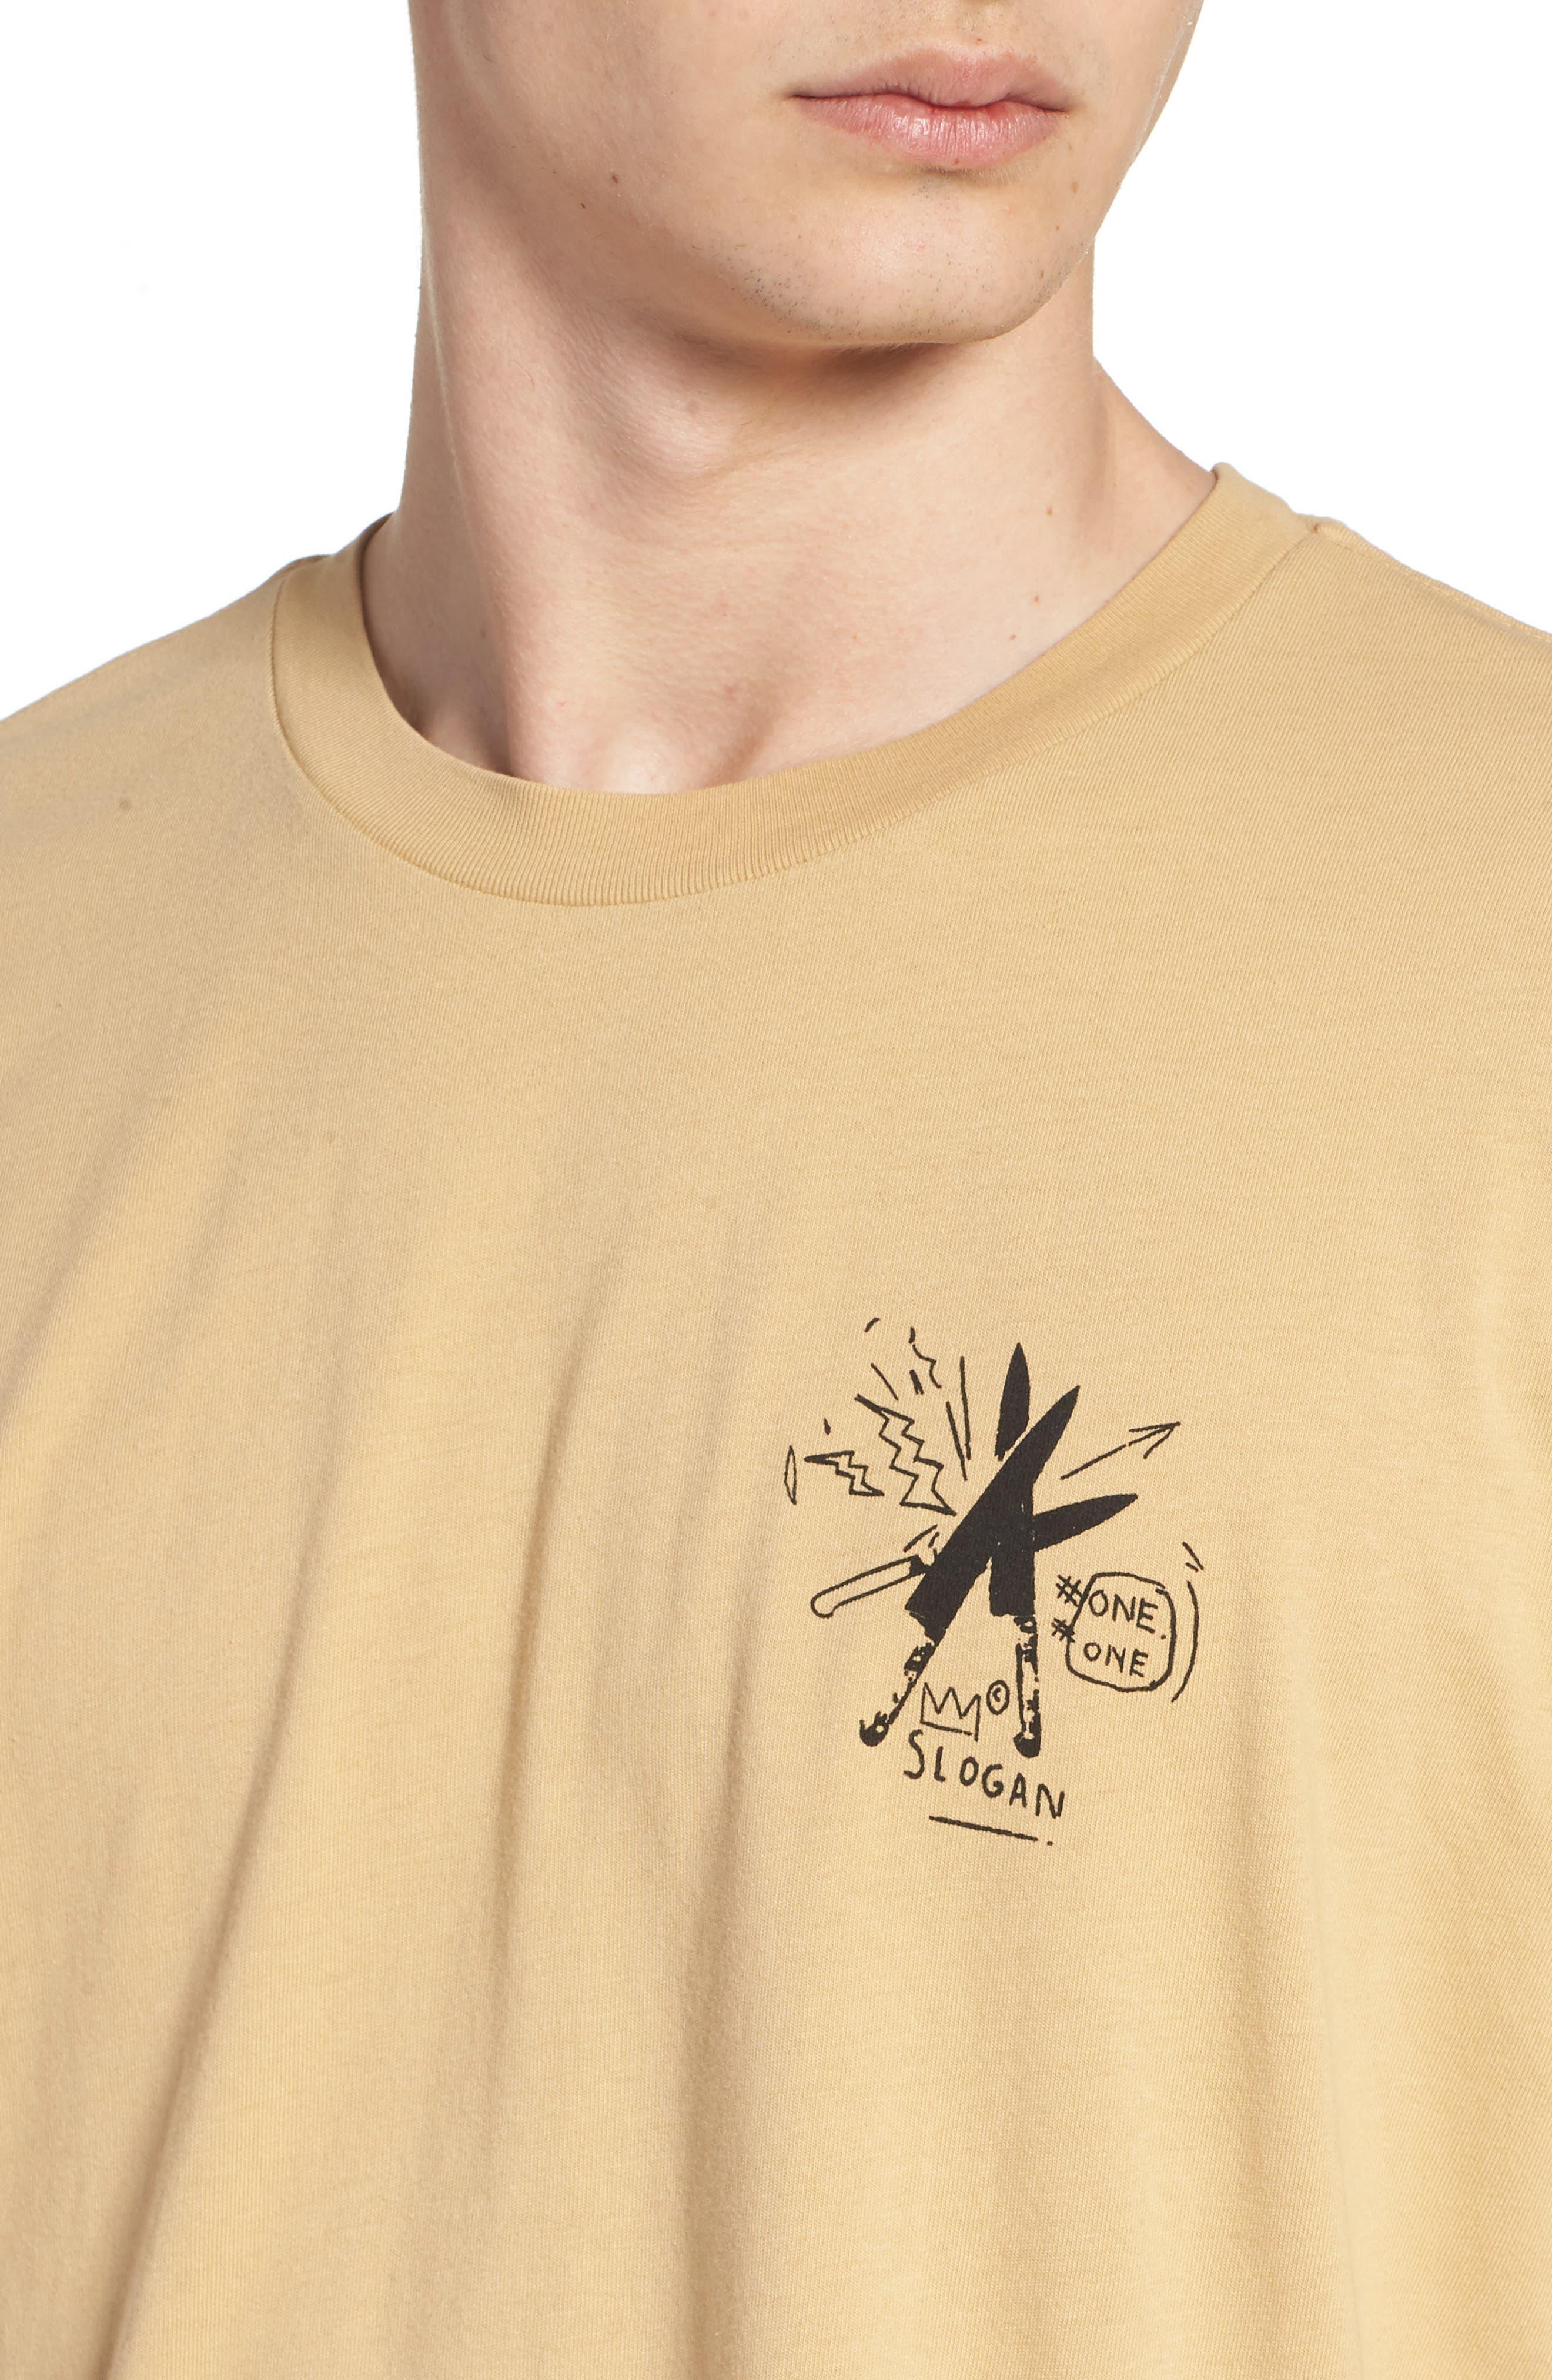 x Warhol Slogan T-Shirt,                             Alternate thumbnail 4, color,                             250